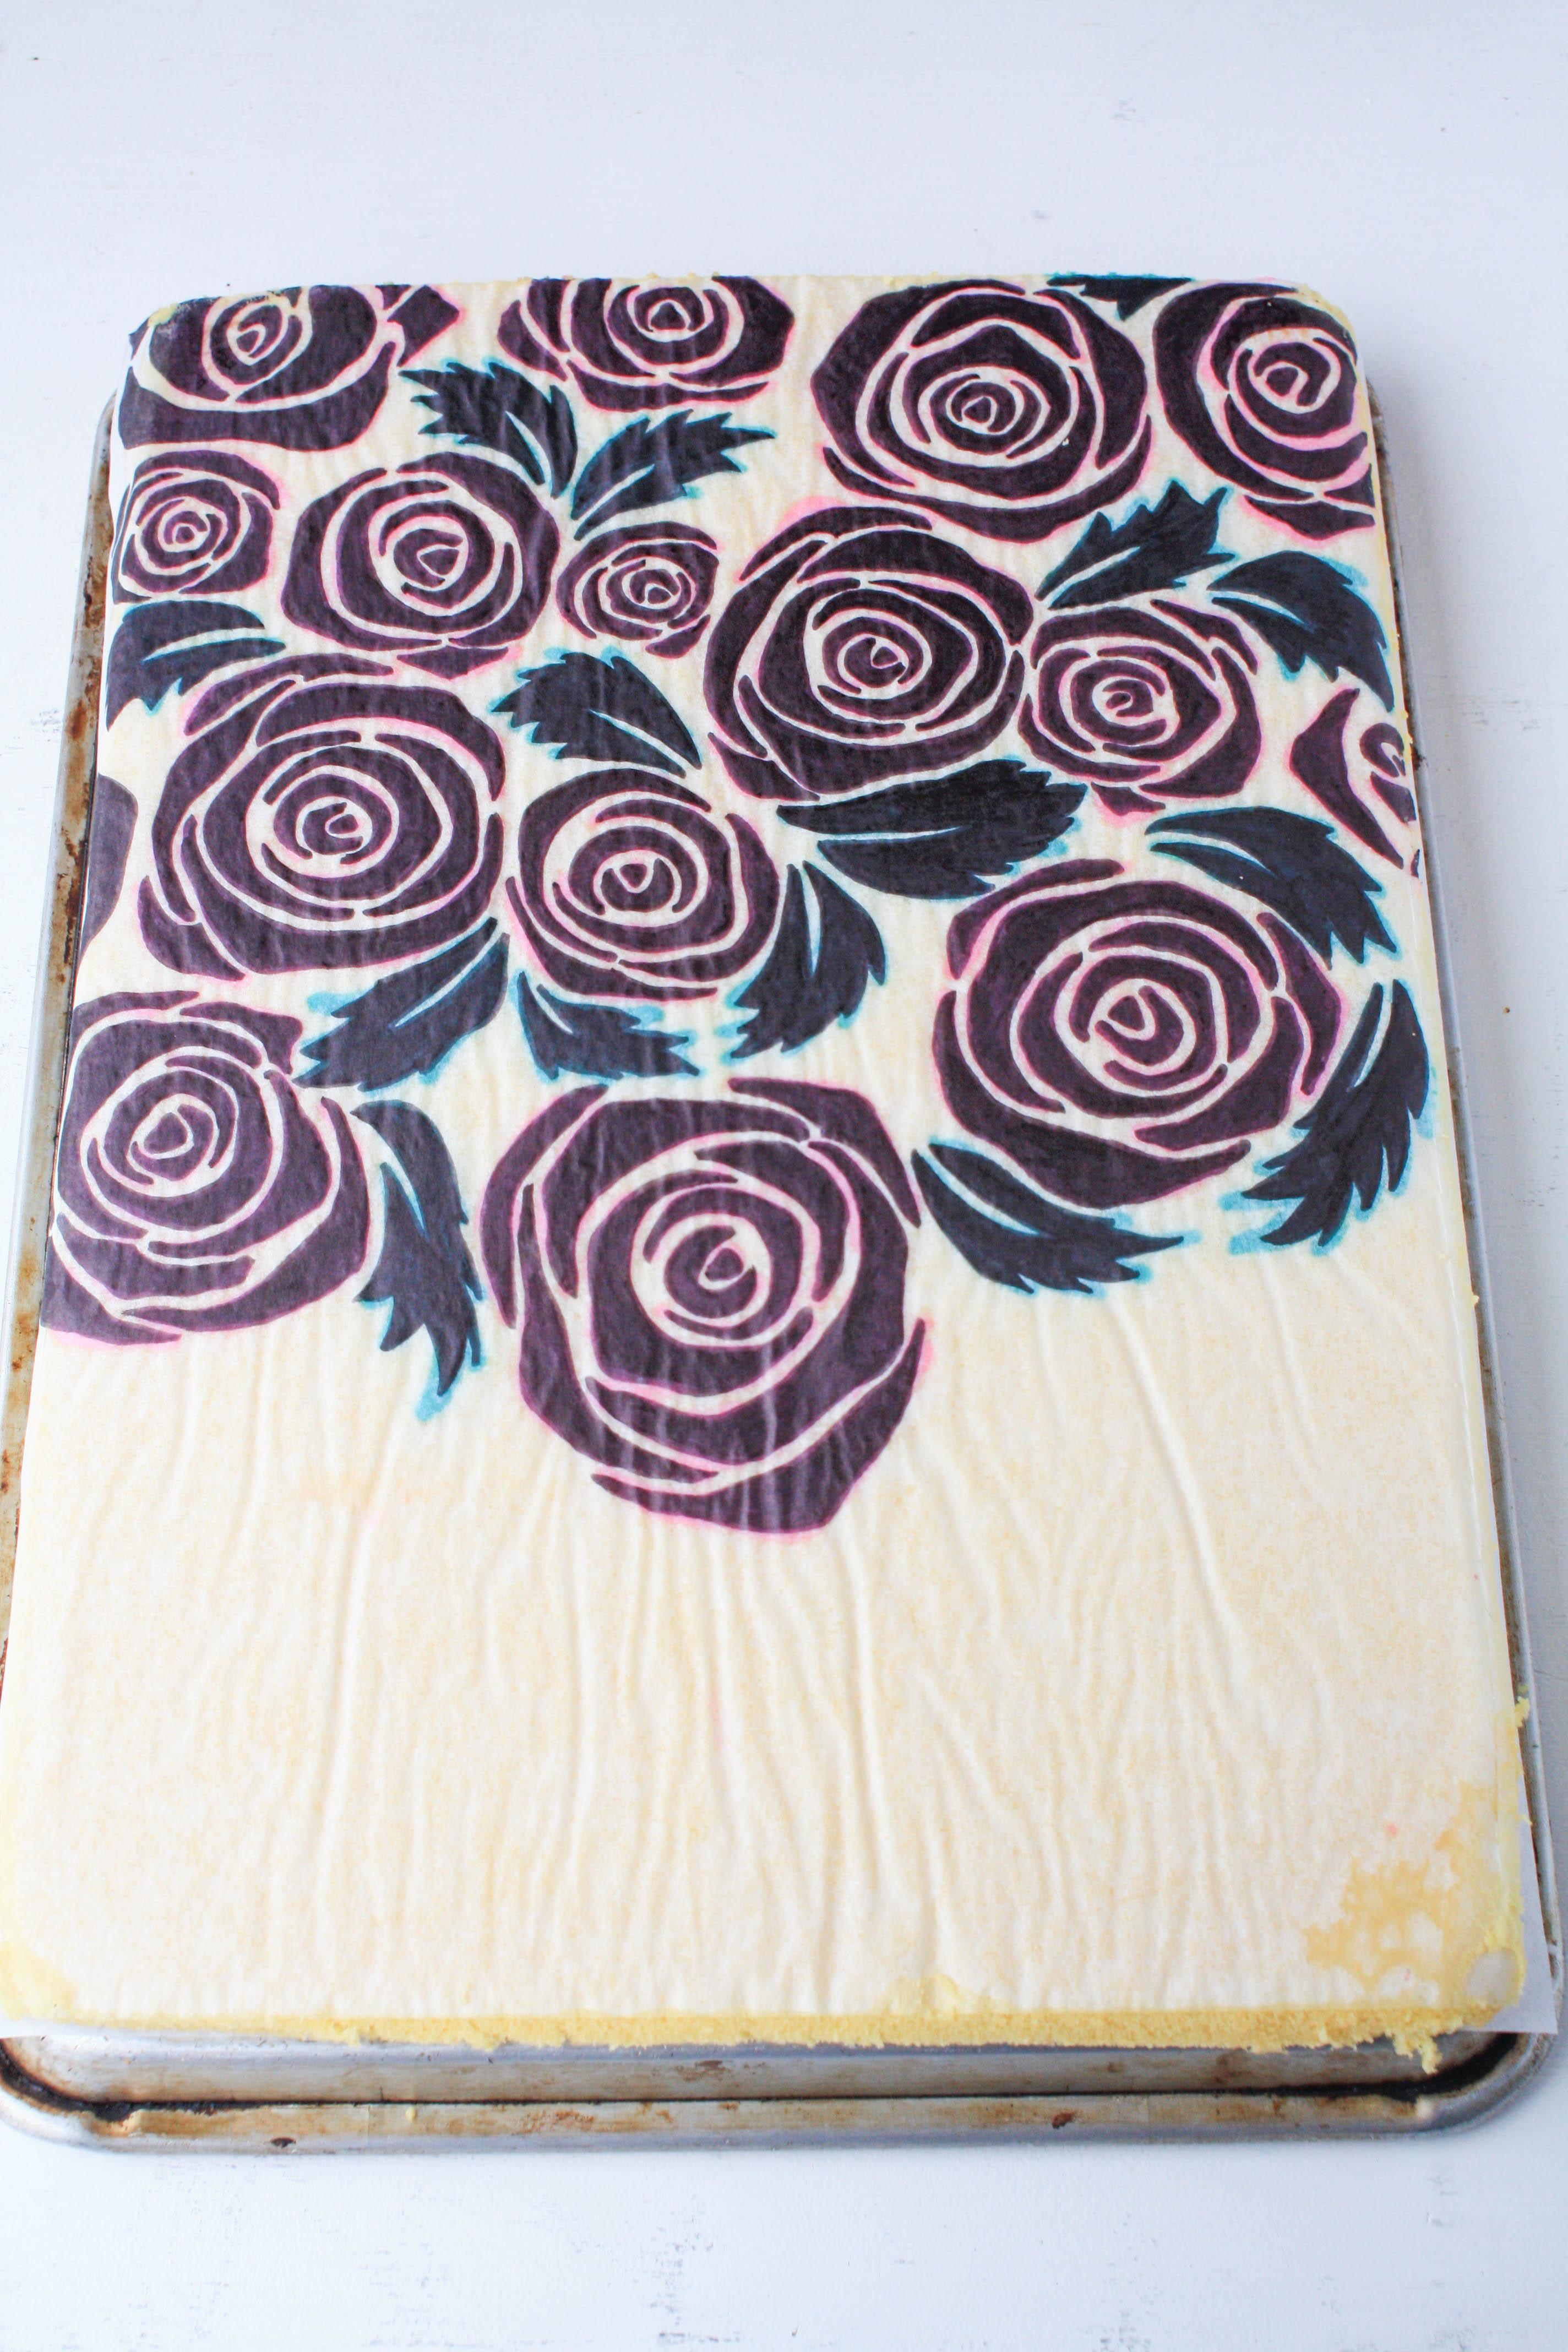 Flipping The Roll Cake | Erin Gardner | Bluprint